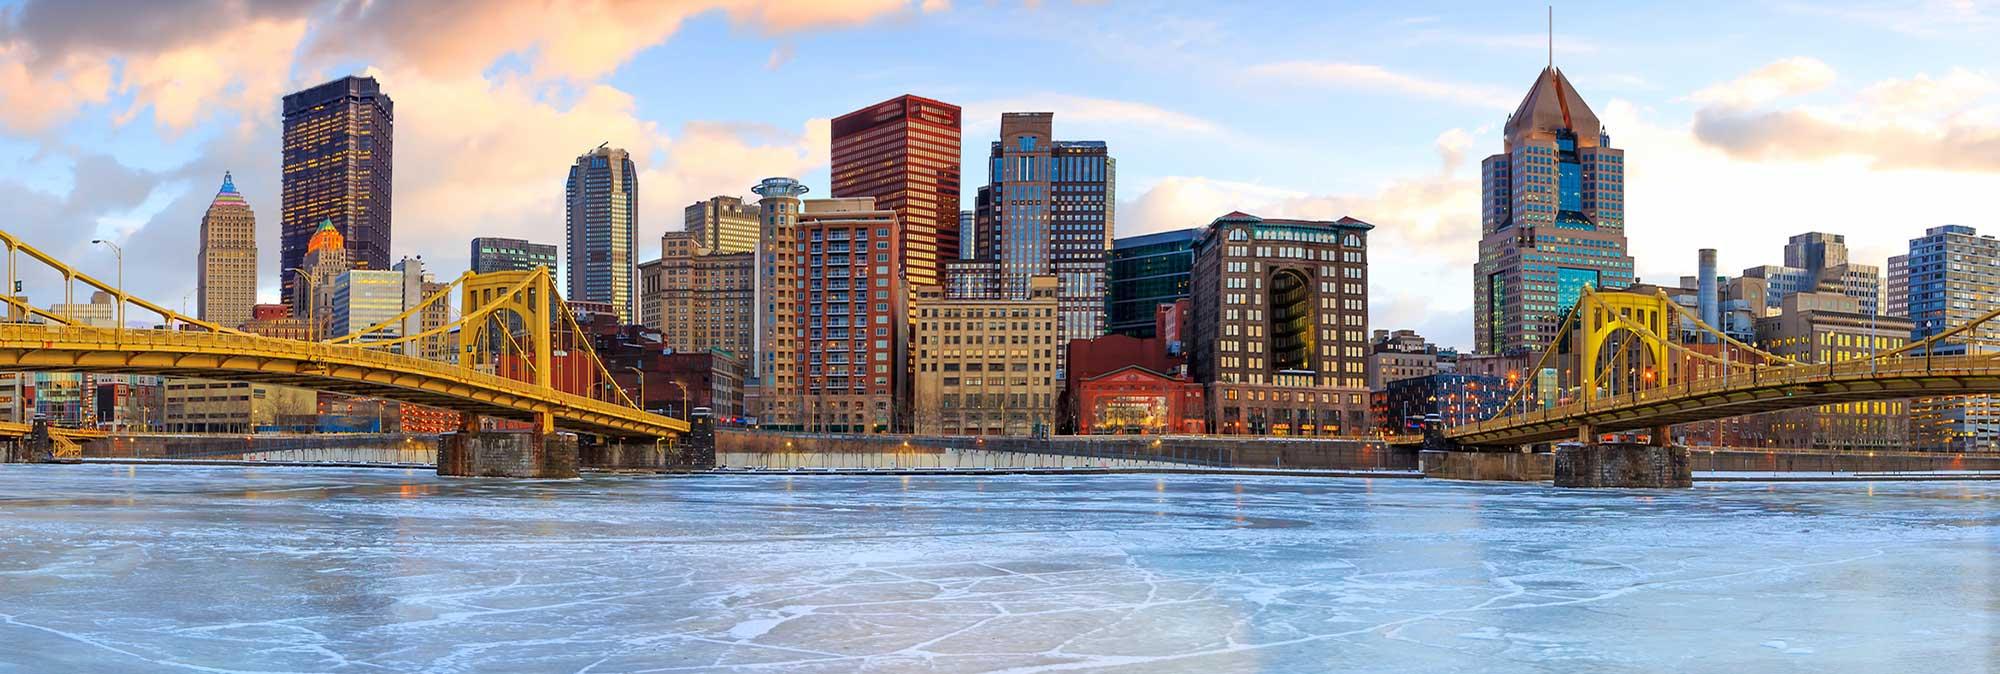 Boston ταχύτητα dating δωρεάν